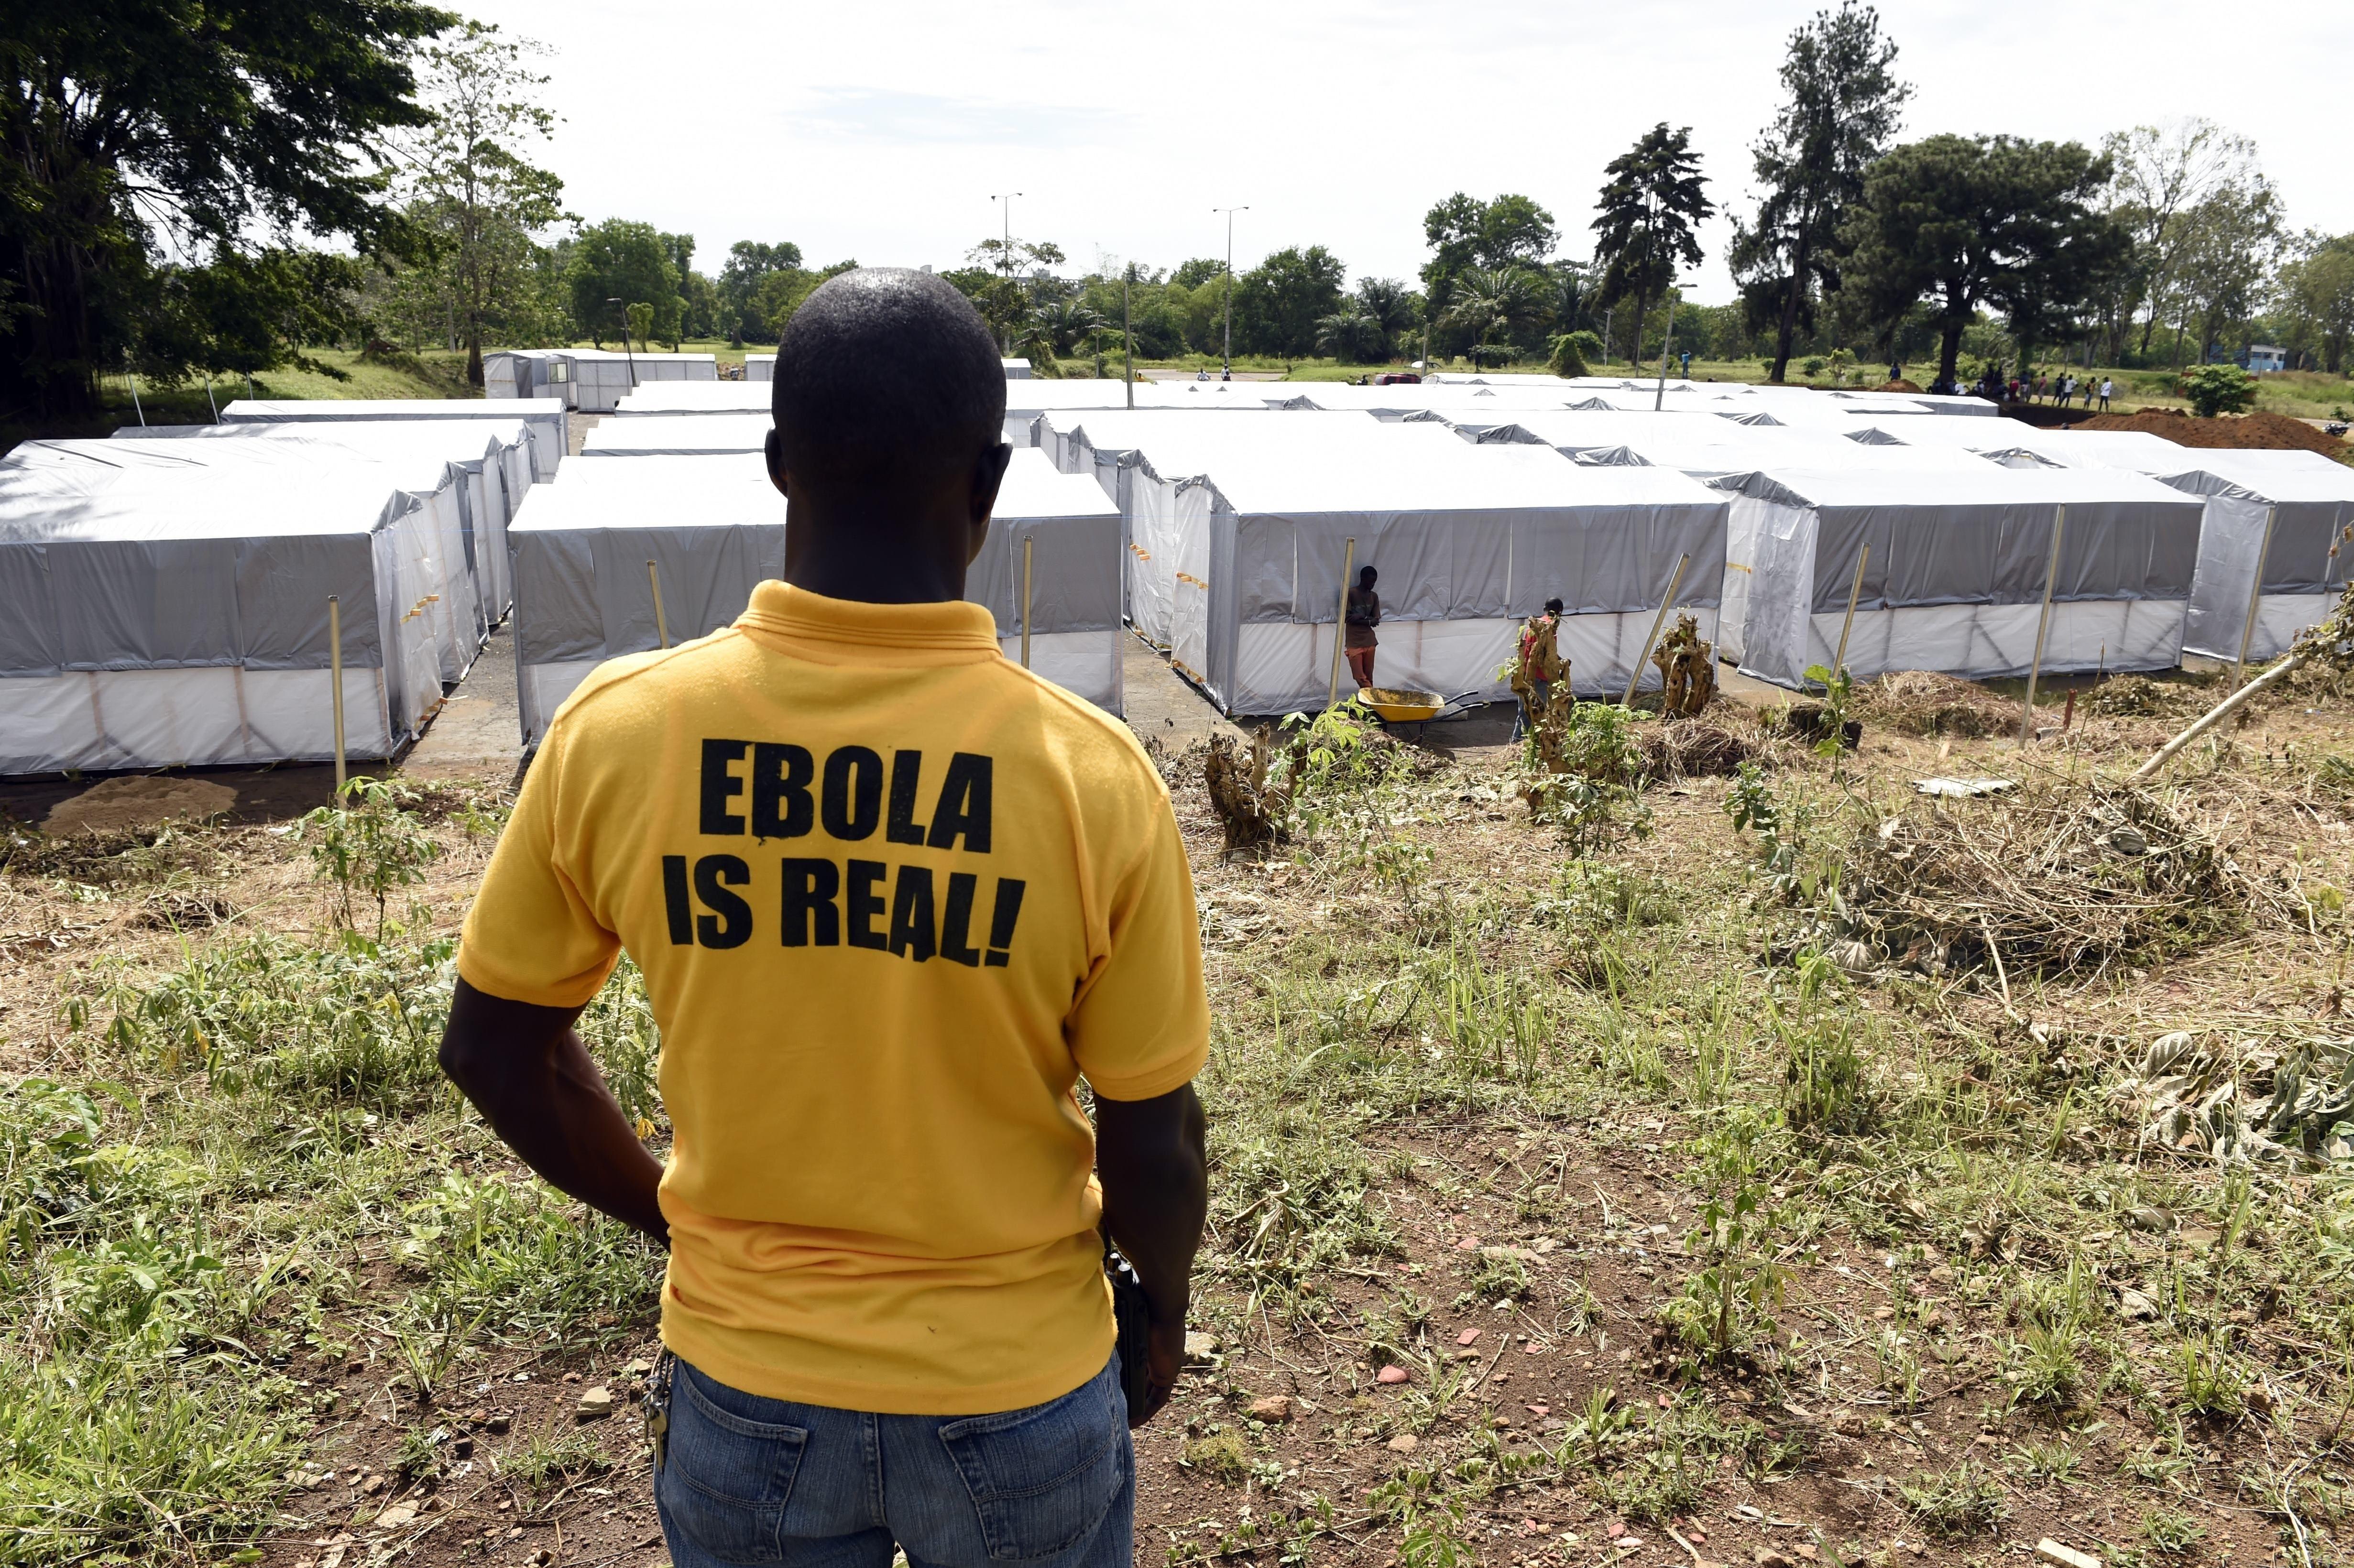 Experimental Drug Jams Ebola Gene To Fight The Virus